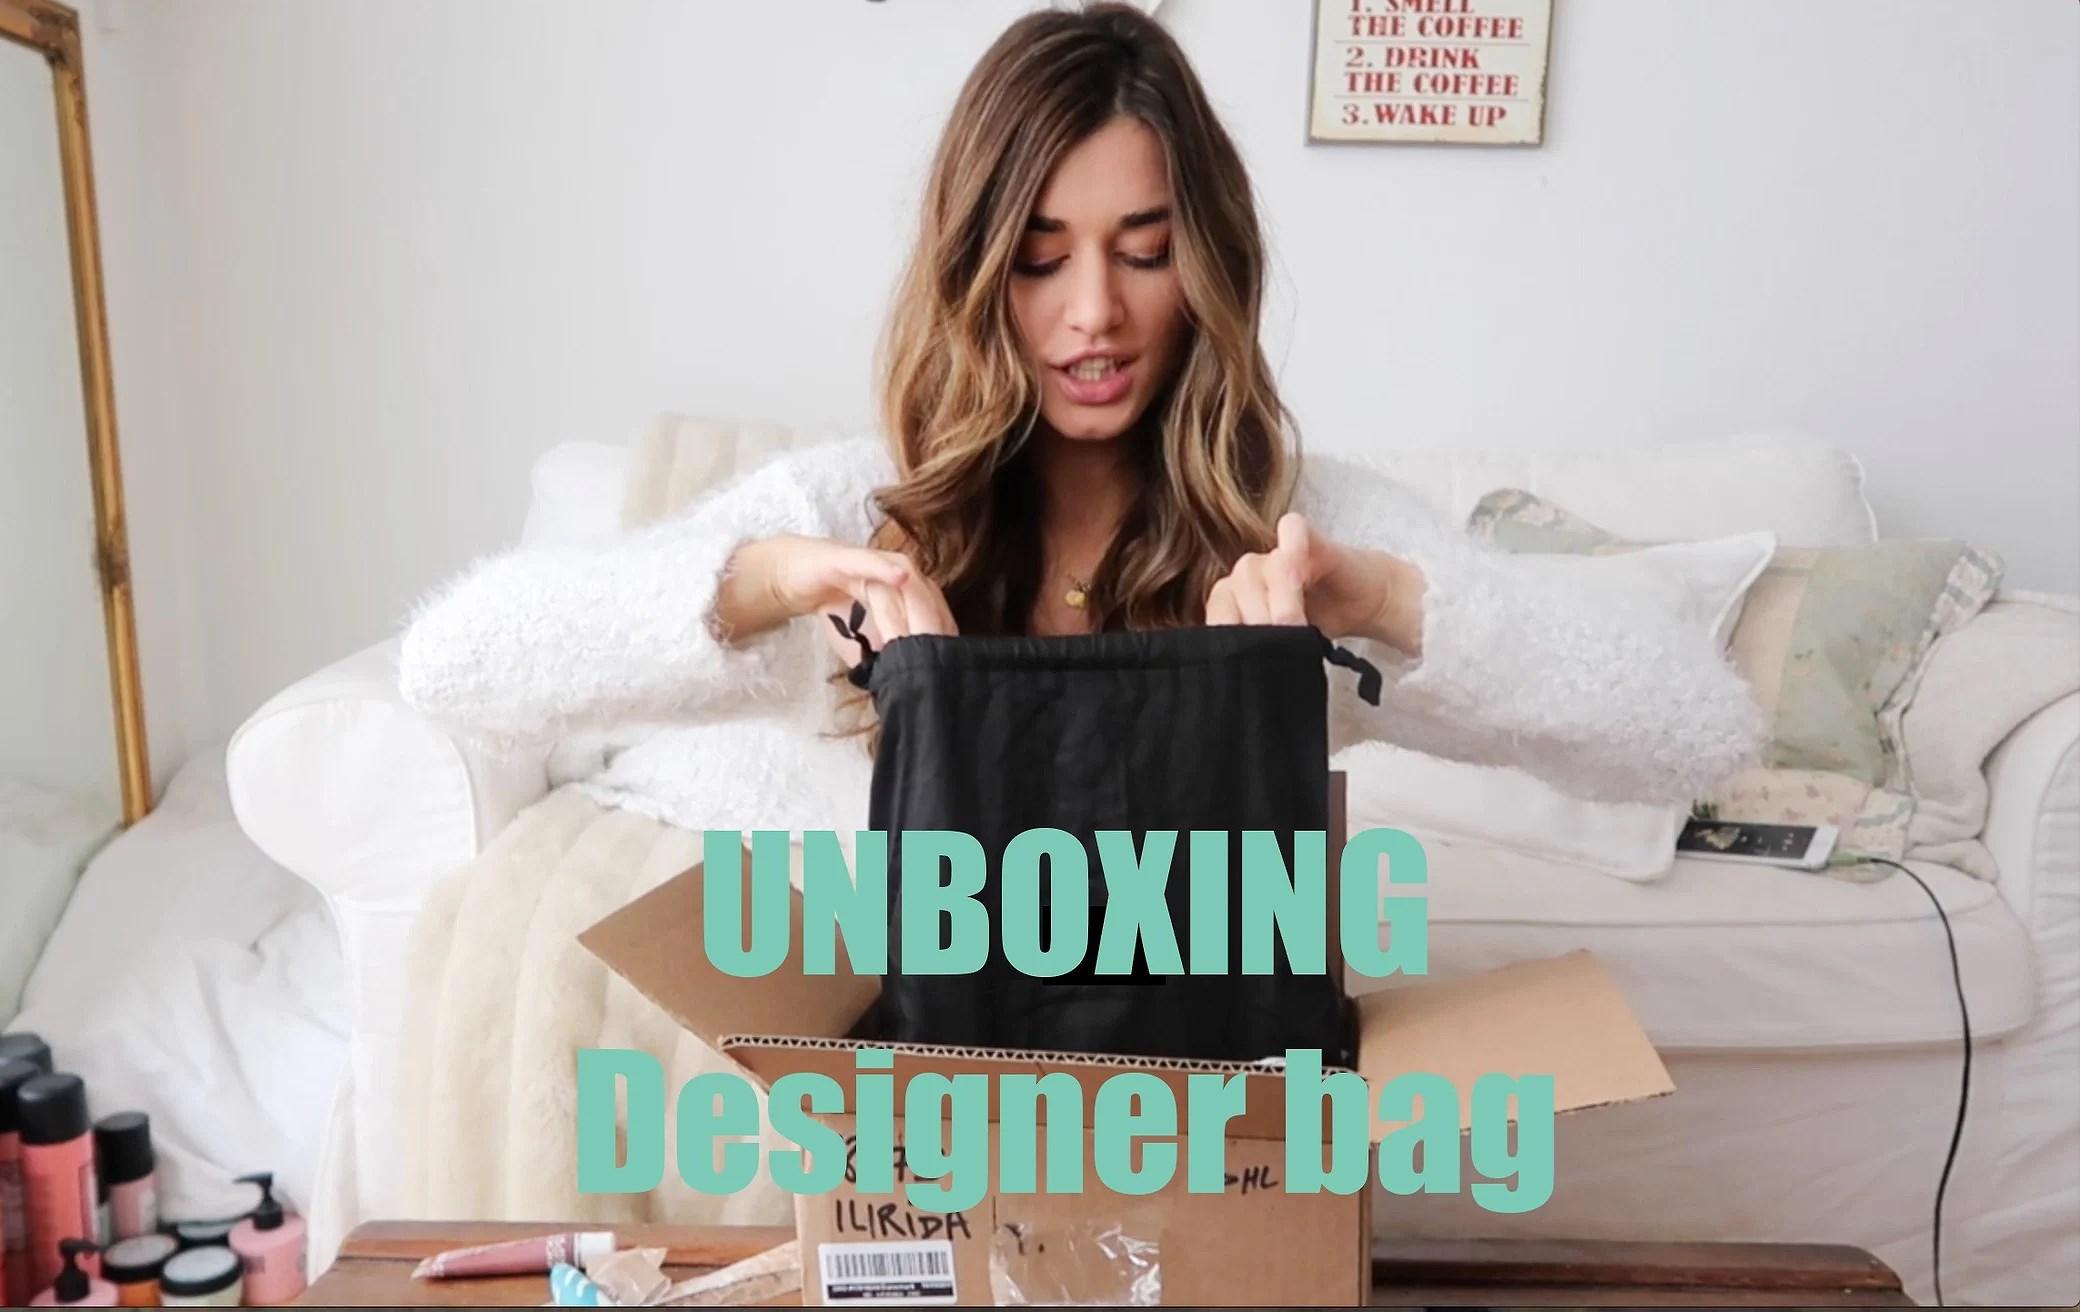 UNBOXING MY NEW DESIGNER BAG